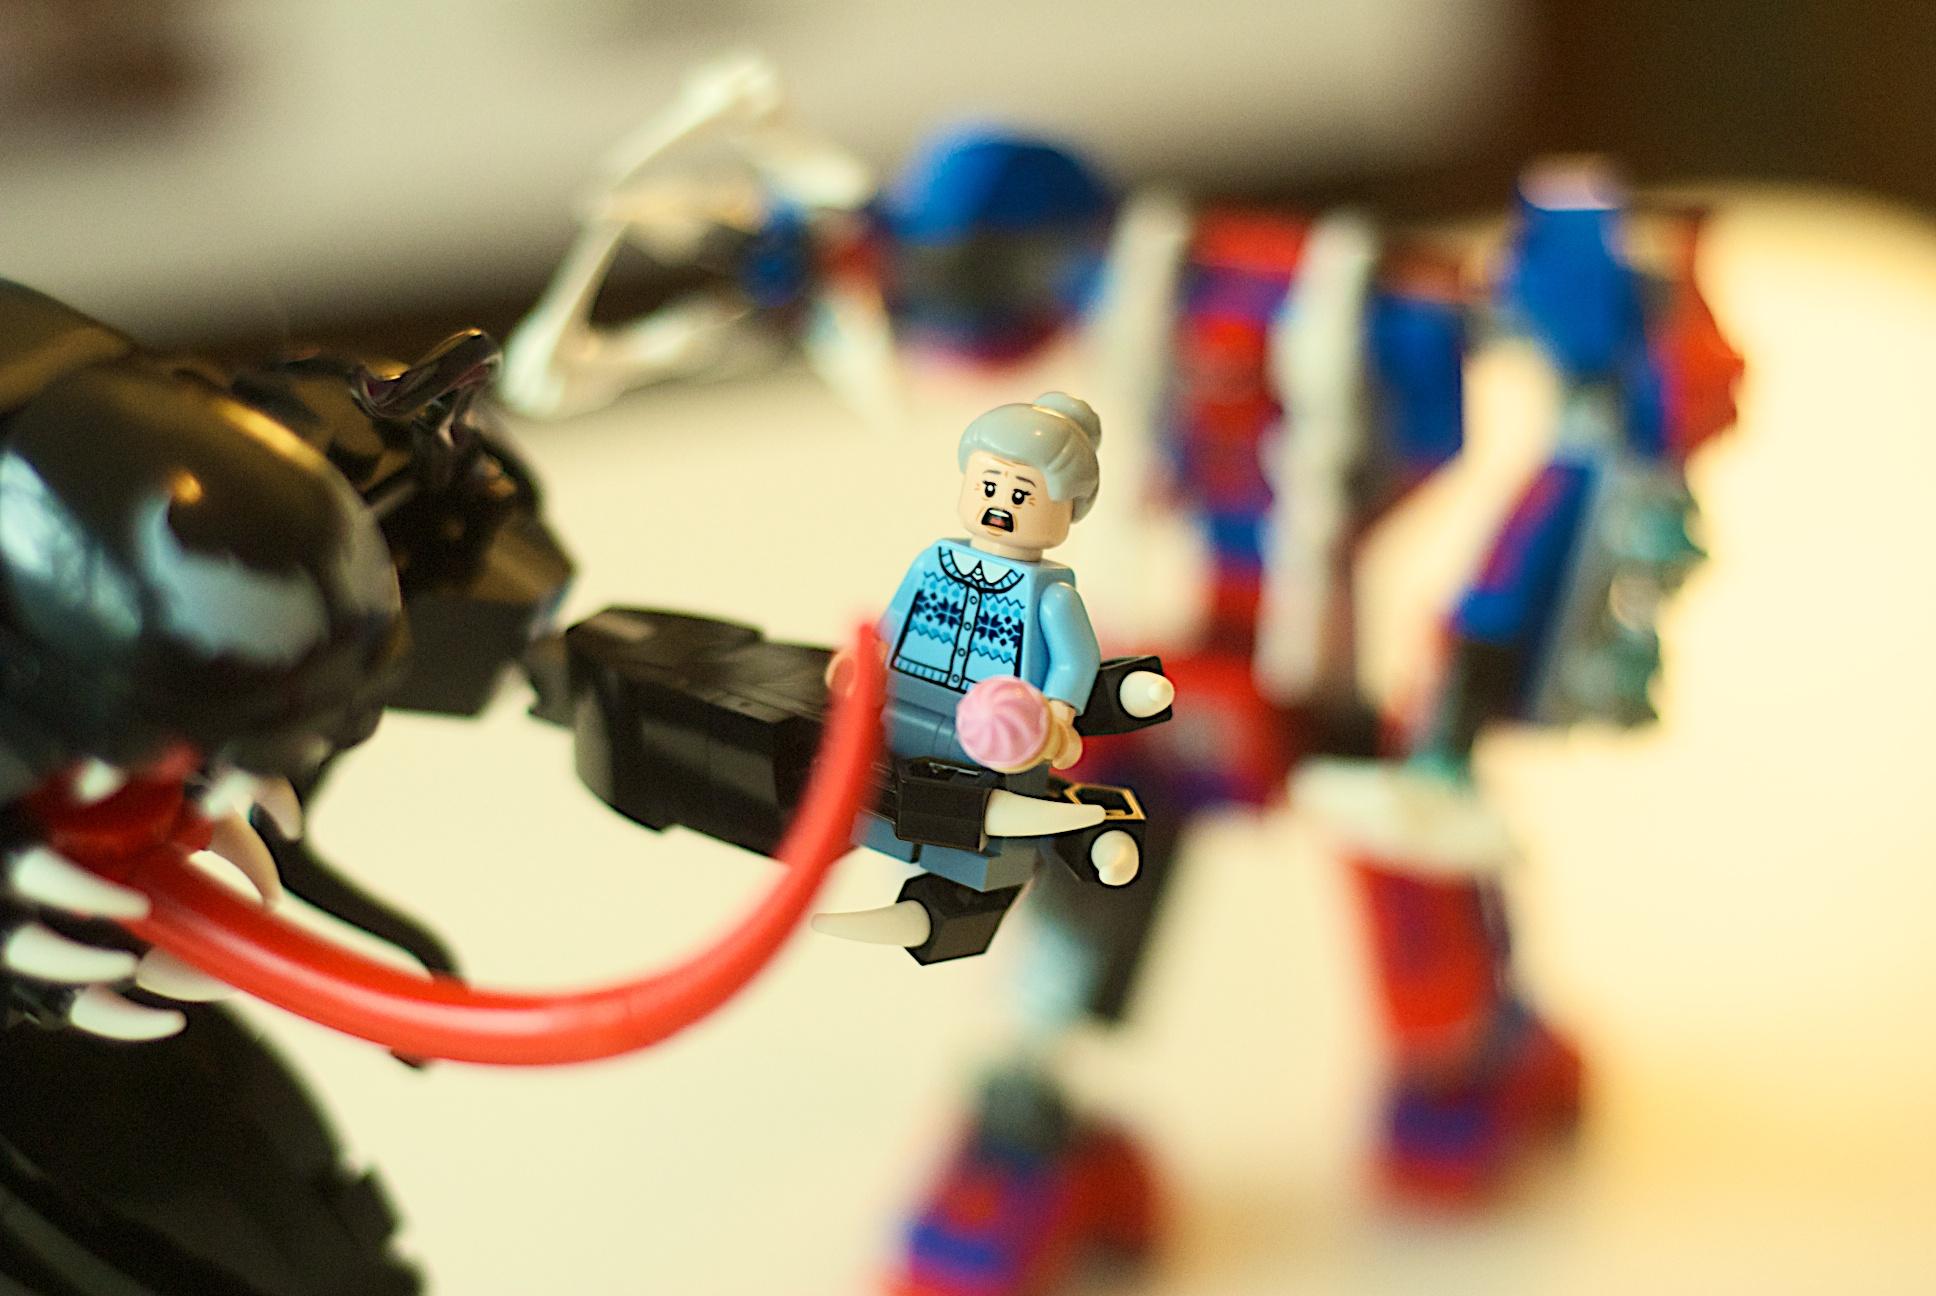 Lego 76115 Mech Mech 76115 Lego Spider Spider VsVenom VsVenom L3ARjqc54